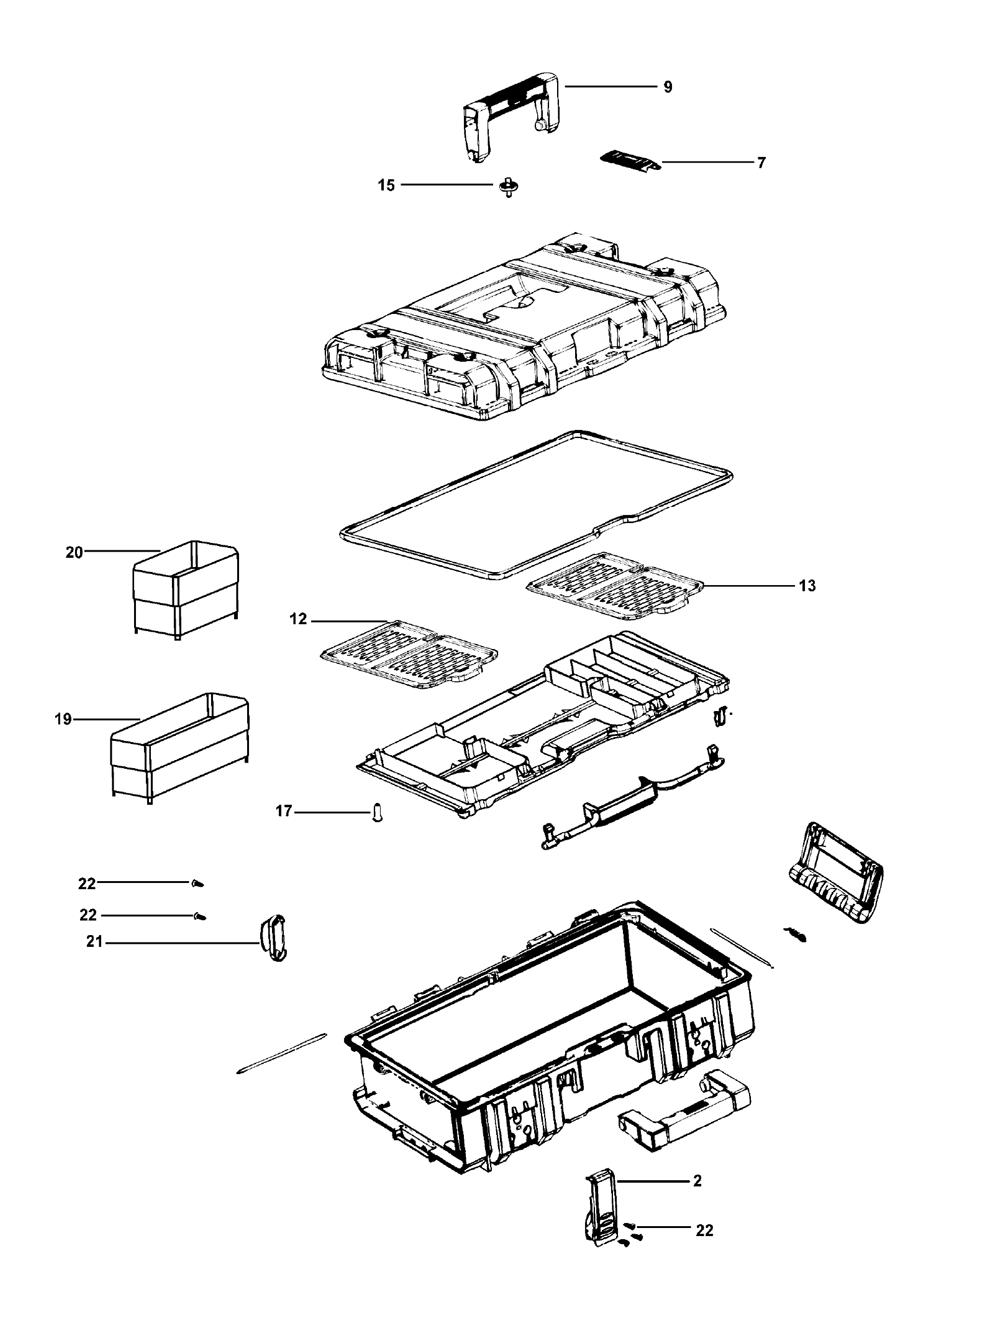 Case Drill Parts : Buy dewalt dwst type small case toughsystem